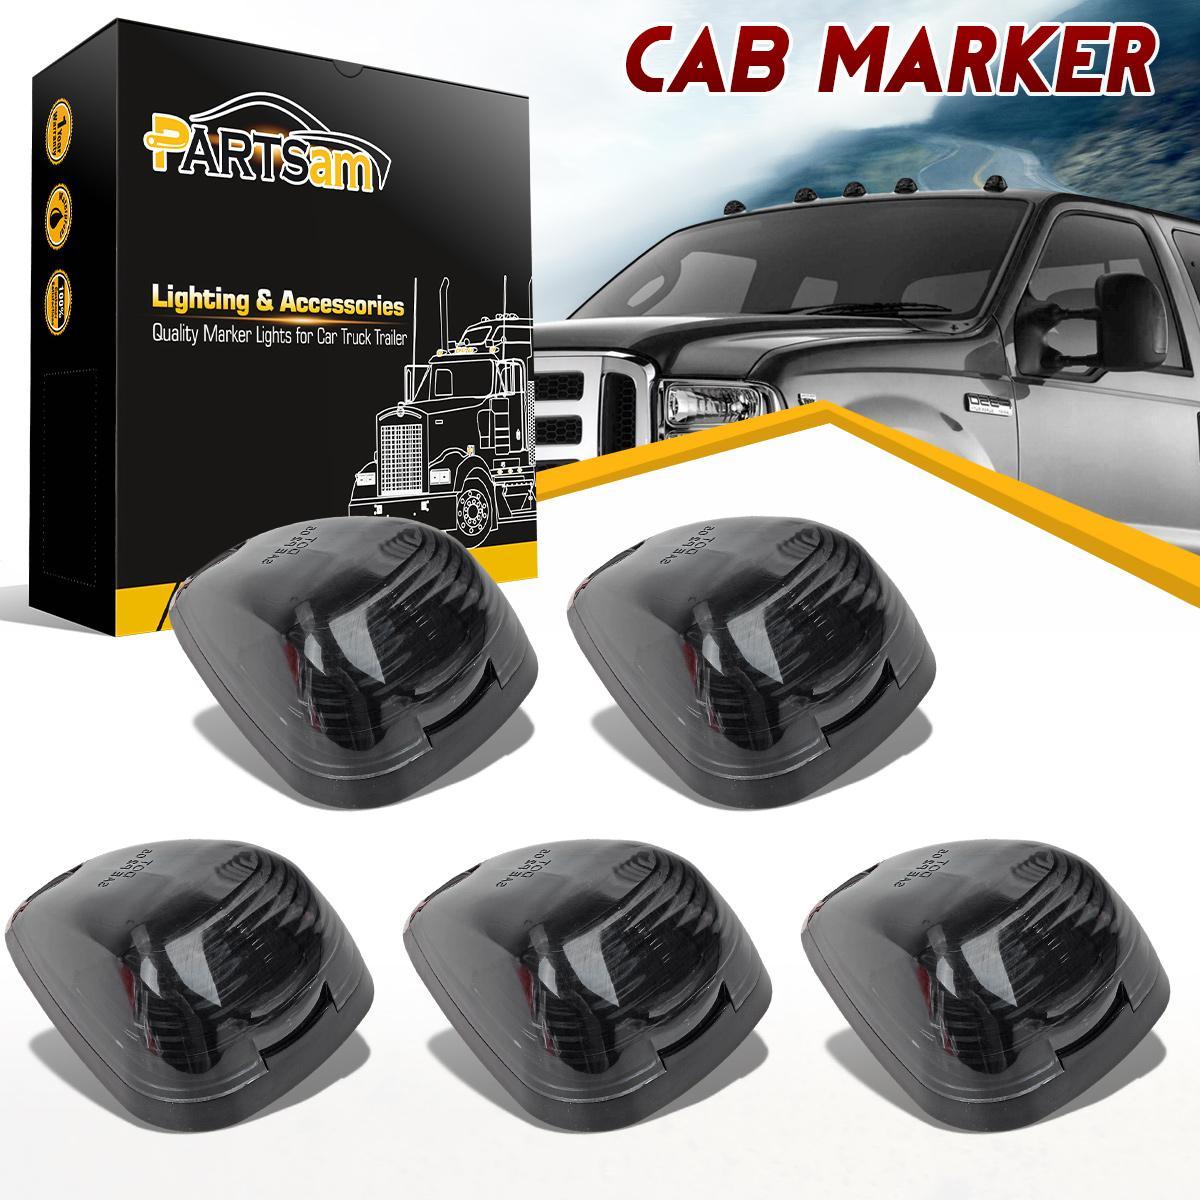 5xSmoke Lens Cab Roof Top Light+ 5xCab Marker Base For 03